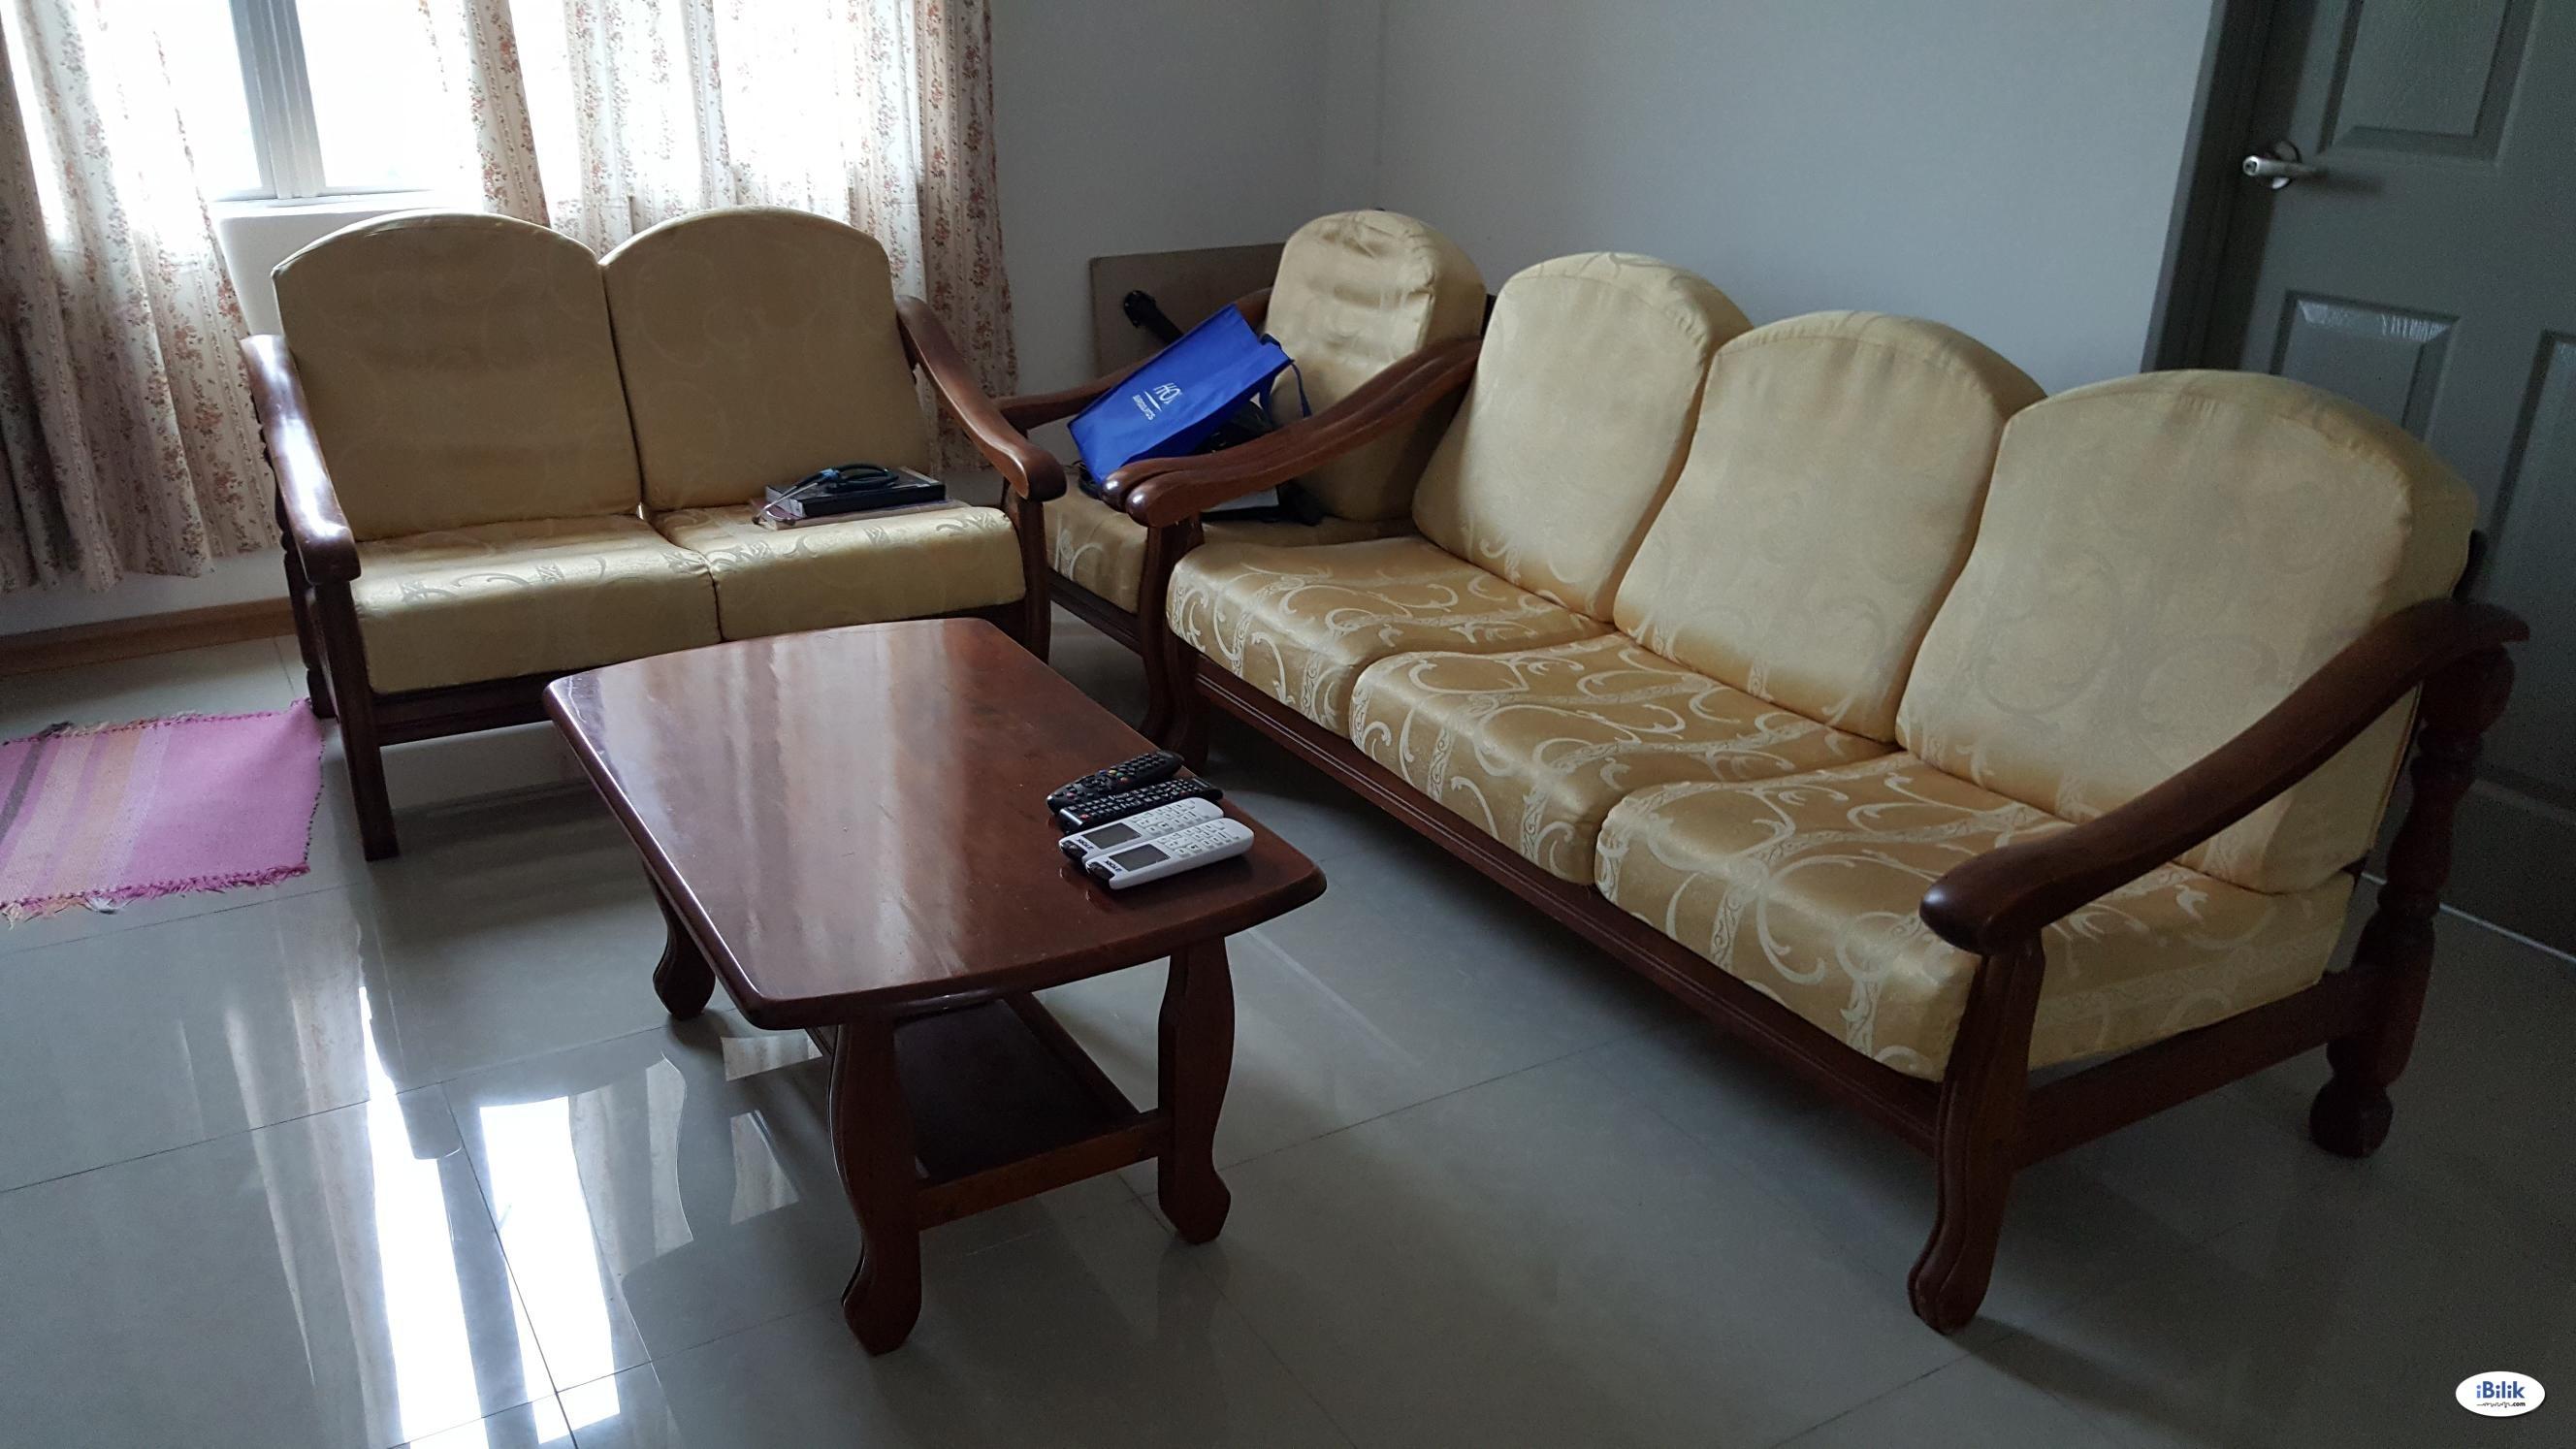 Master Room for rent at Seremban, Bukit tembok, Permai, very near to Hospital tuanku jaafar, seremban GH,